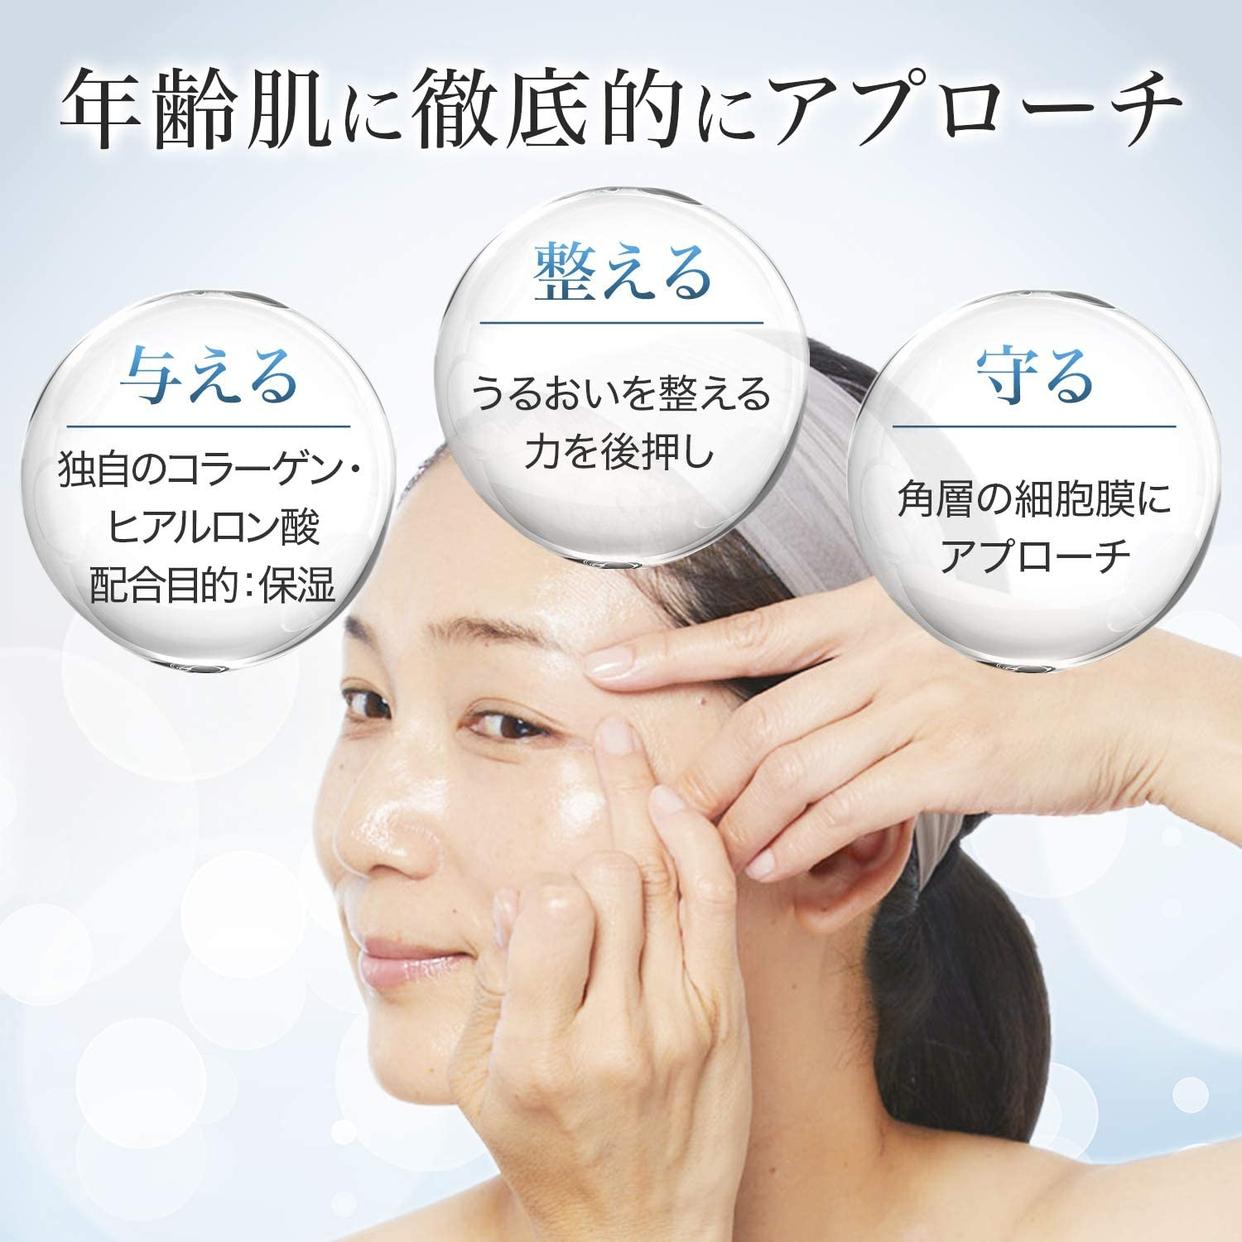 Domohorn Wrinkle(ドモホルンリンクル) クリーム20の商品画像5